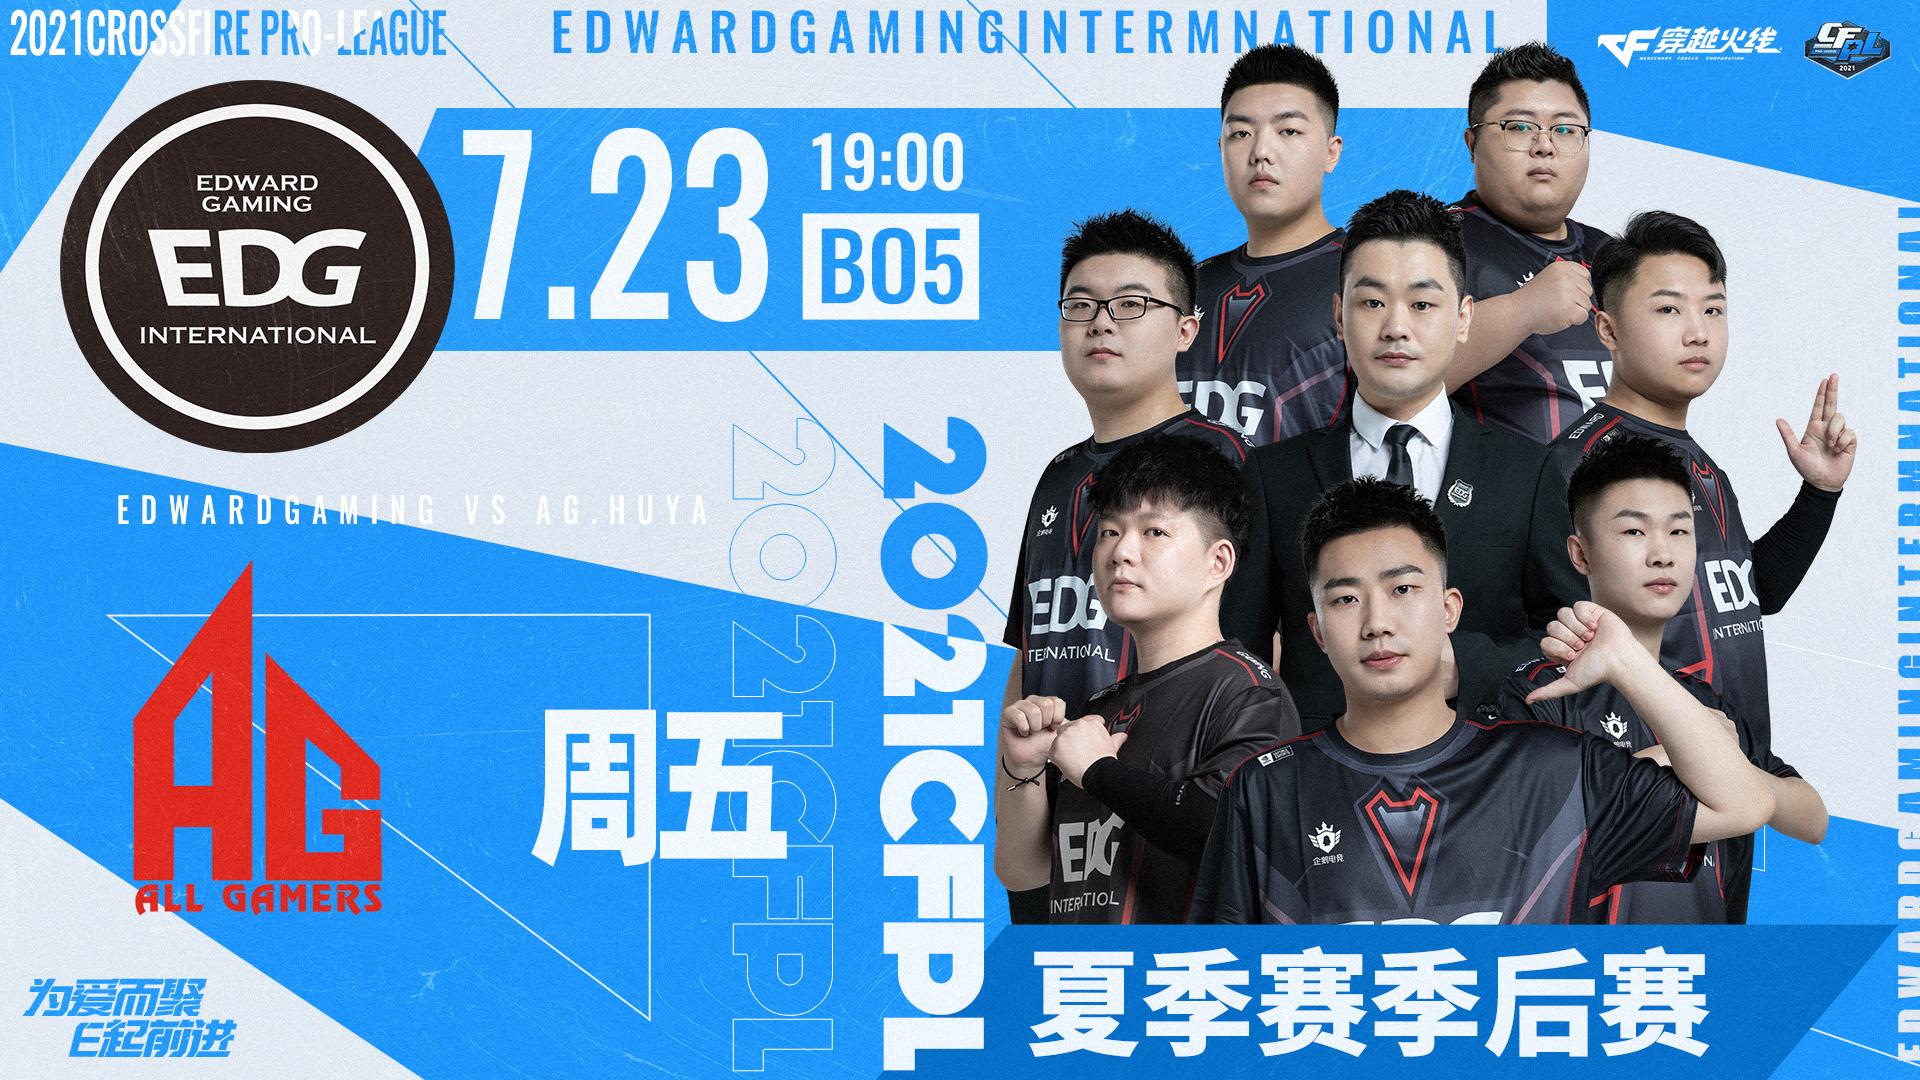 [CFPL] EDG 季后赛取得首胜,CZY:后面的比赛都会倾尽全力